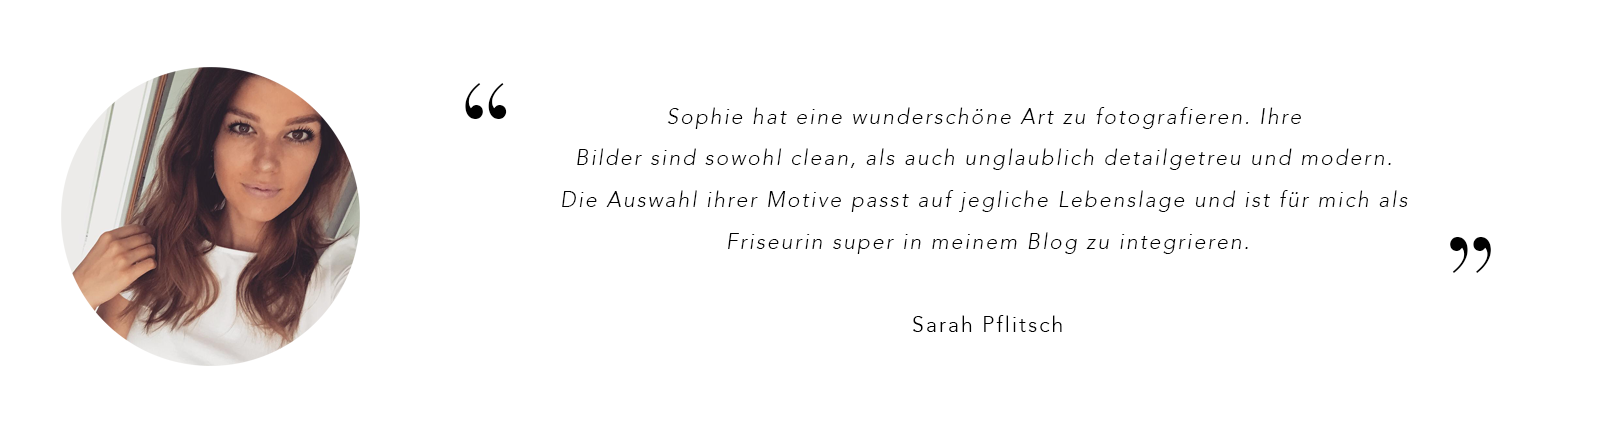 Testimonial_Sarah